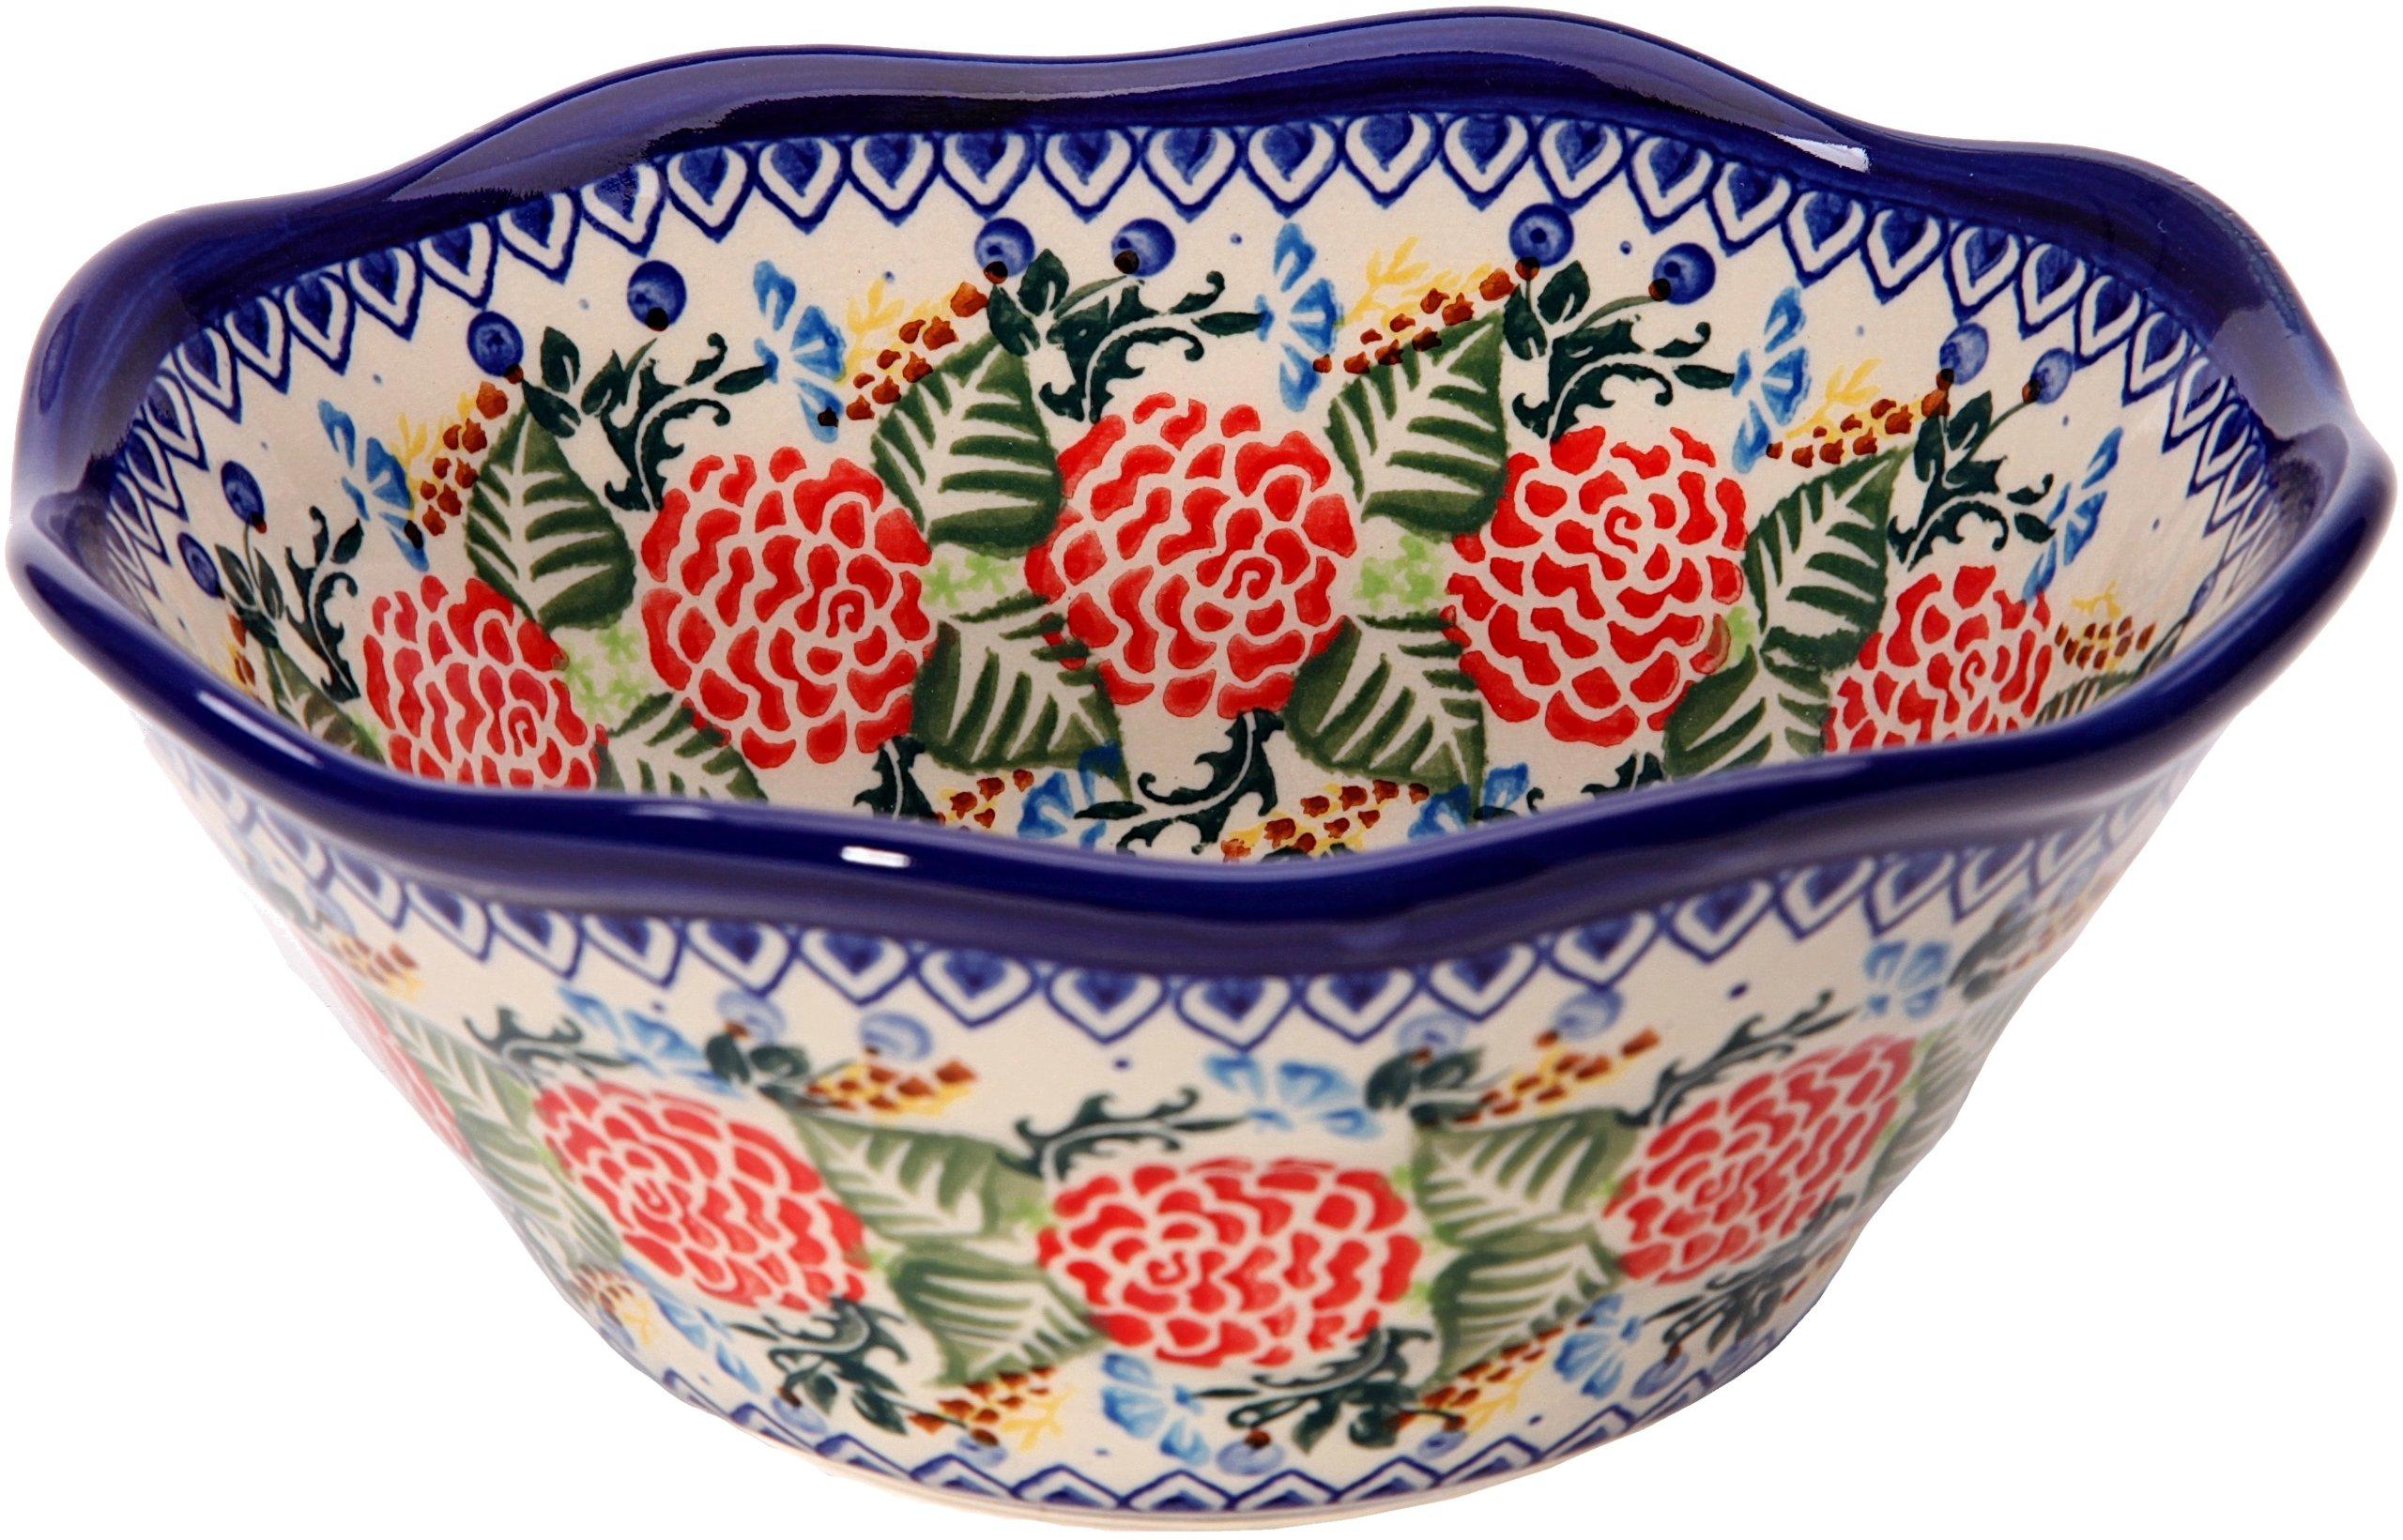 Polish Pottery Ceramika Boleslawiec 0423/280 Royal Blue Patterns with Red Rose Motif Bowl Viki 1, 3-1/4 Cup